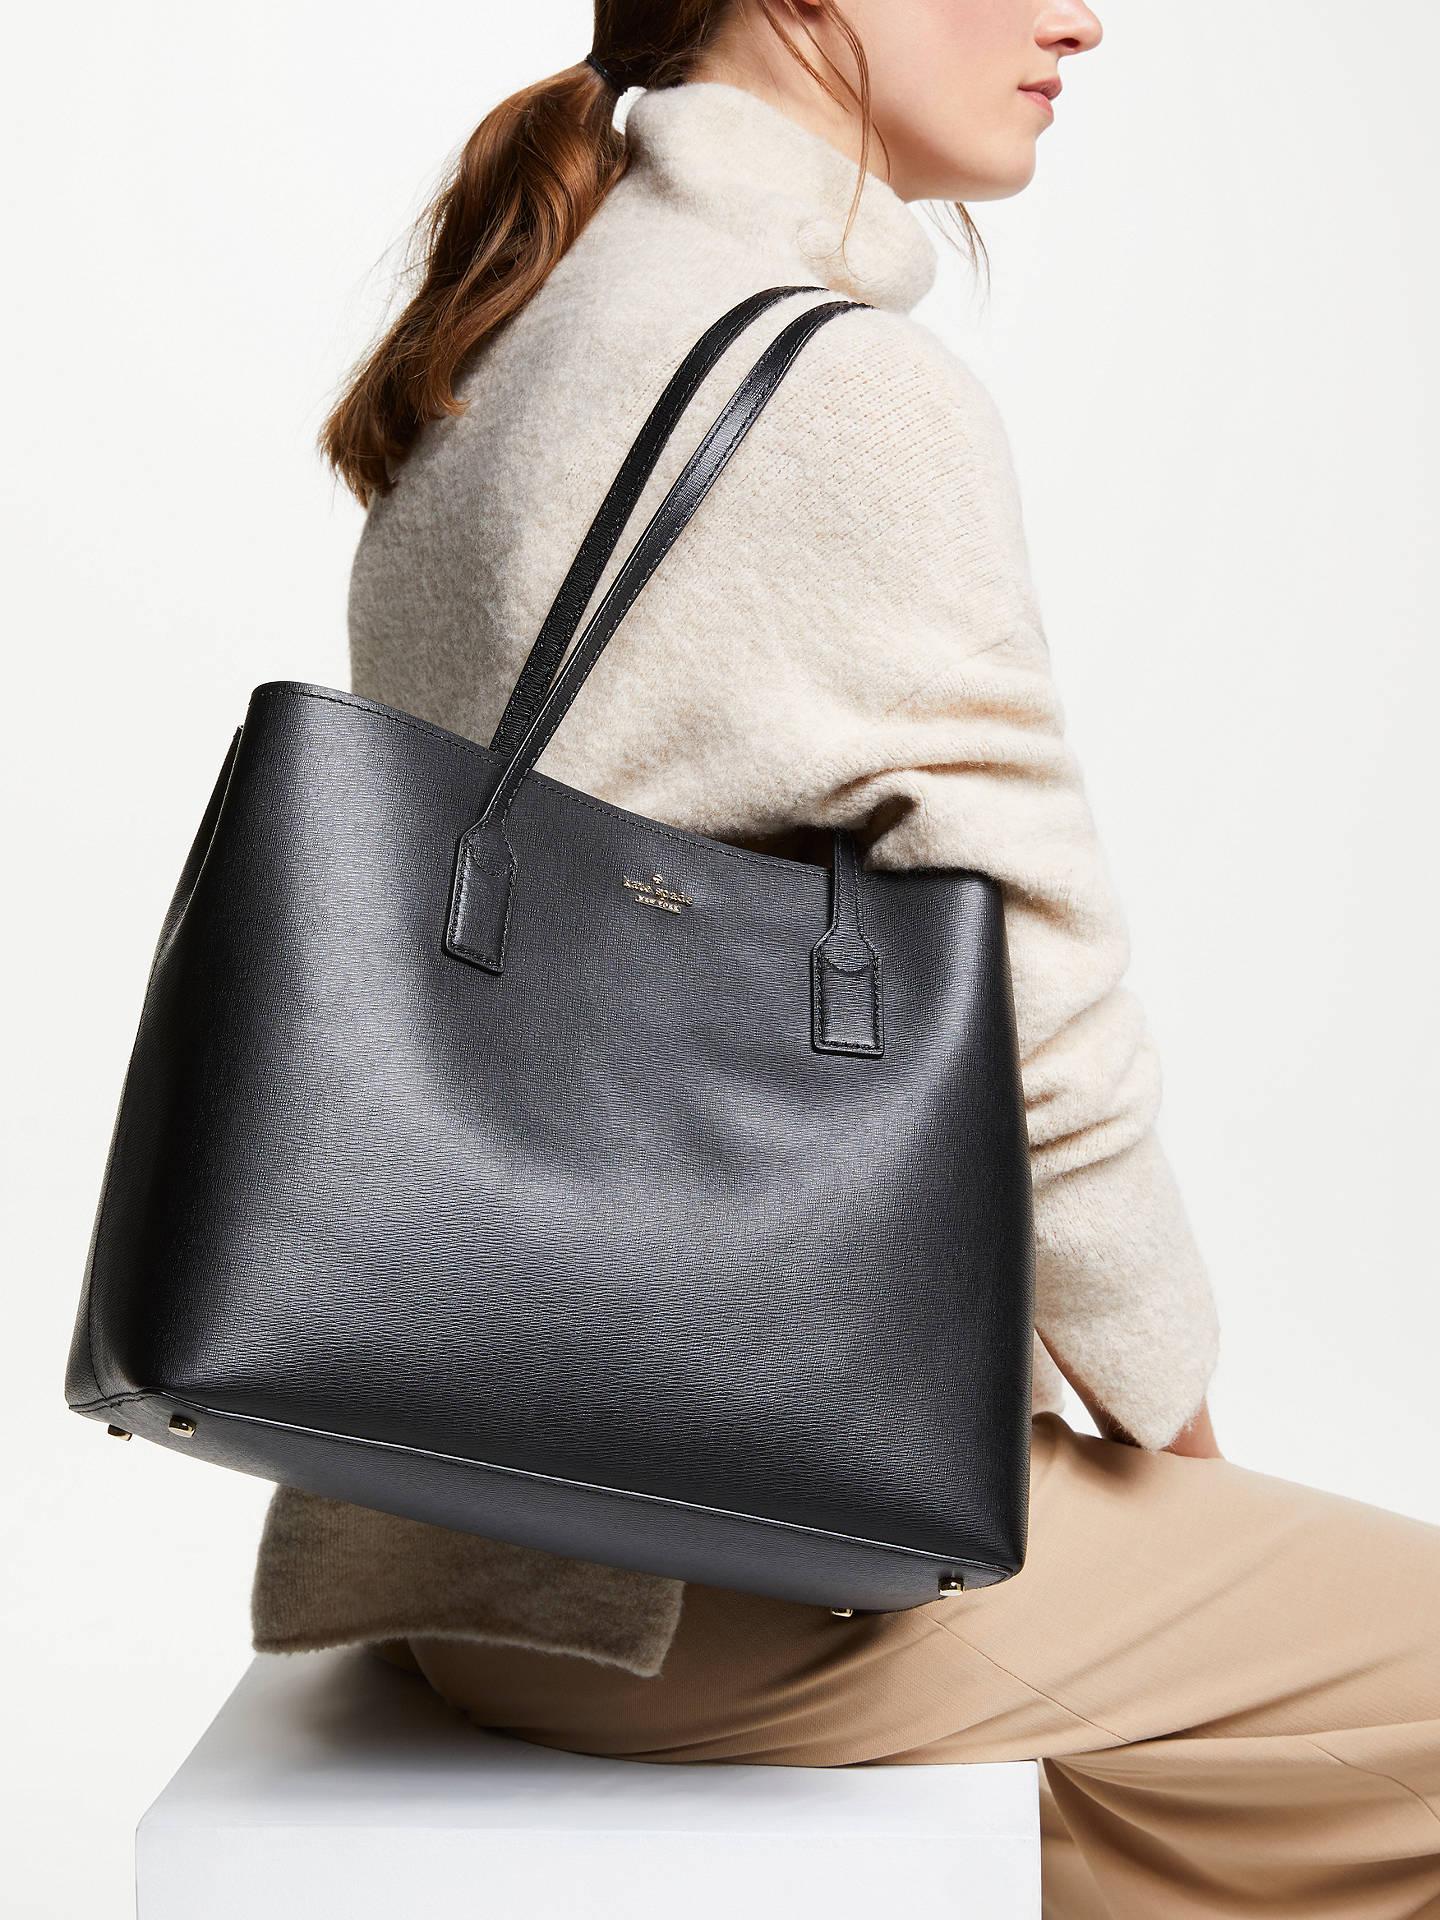 506af8e09c9c ... Buy kate spade new york Hadley Road Dina Leather Handbag